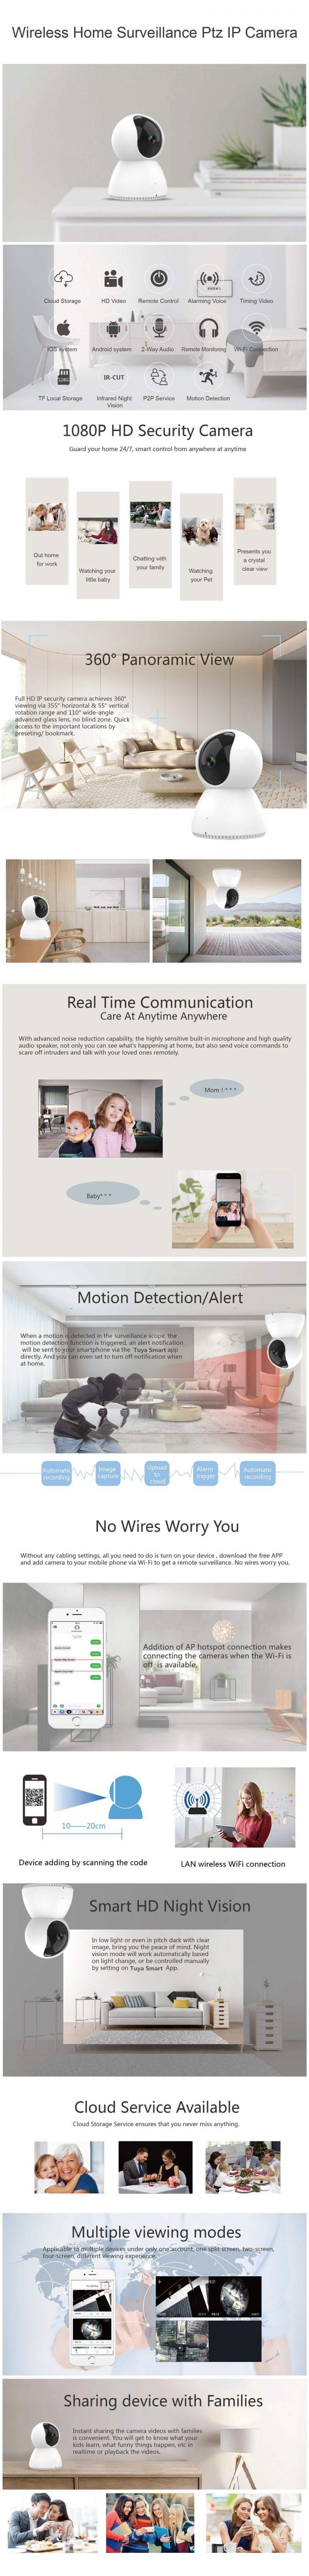 C230 Tuya 1080P IP Camera for home security